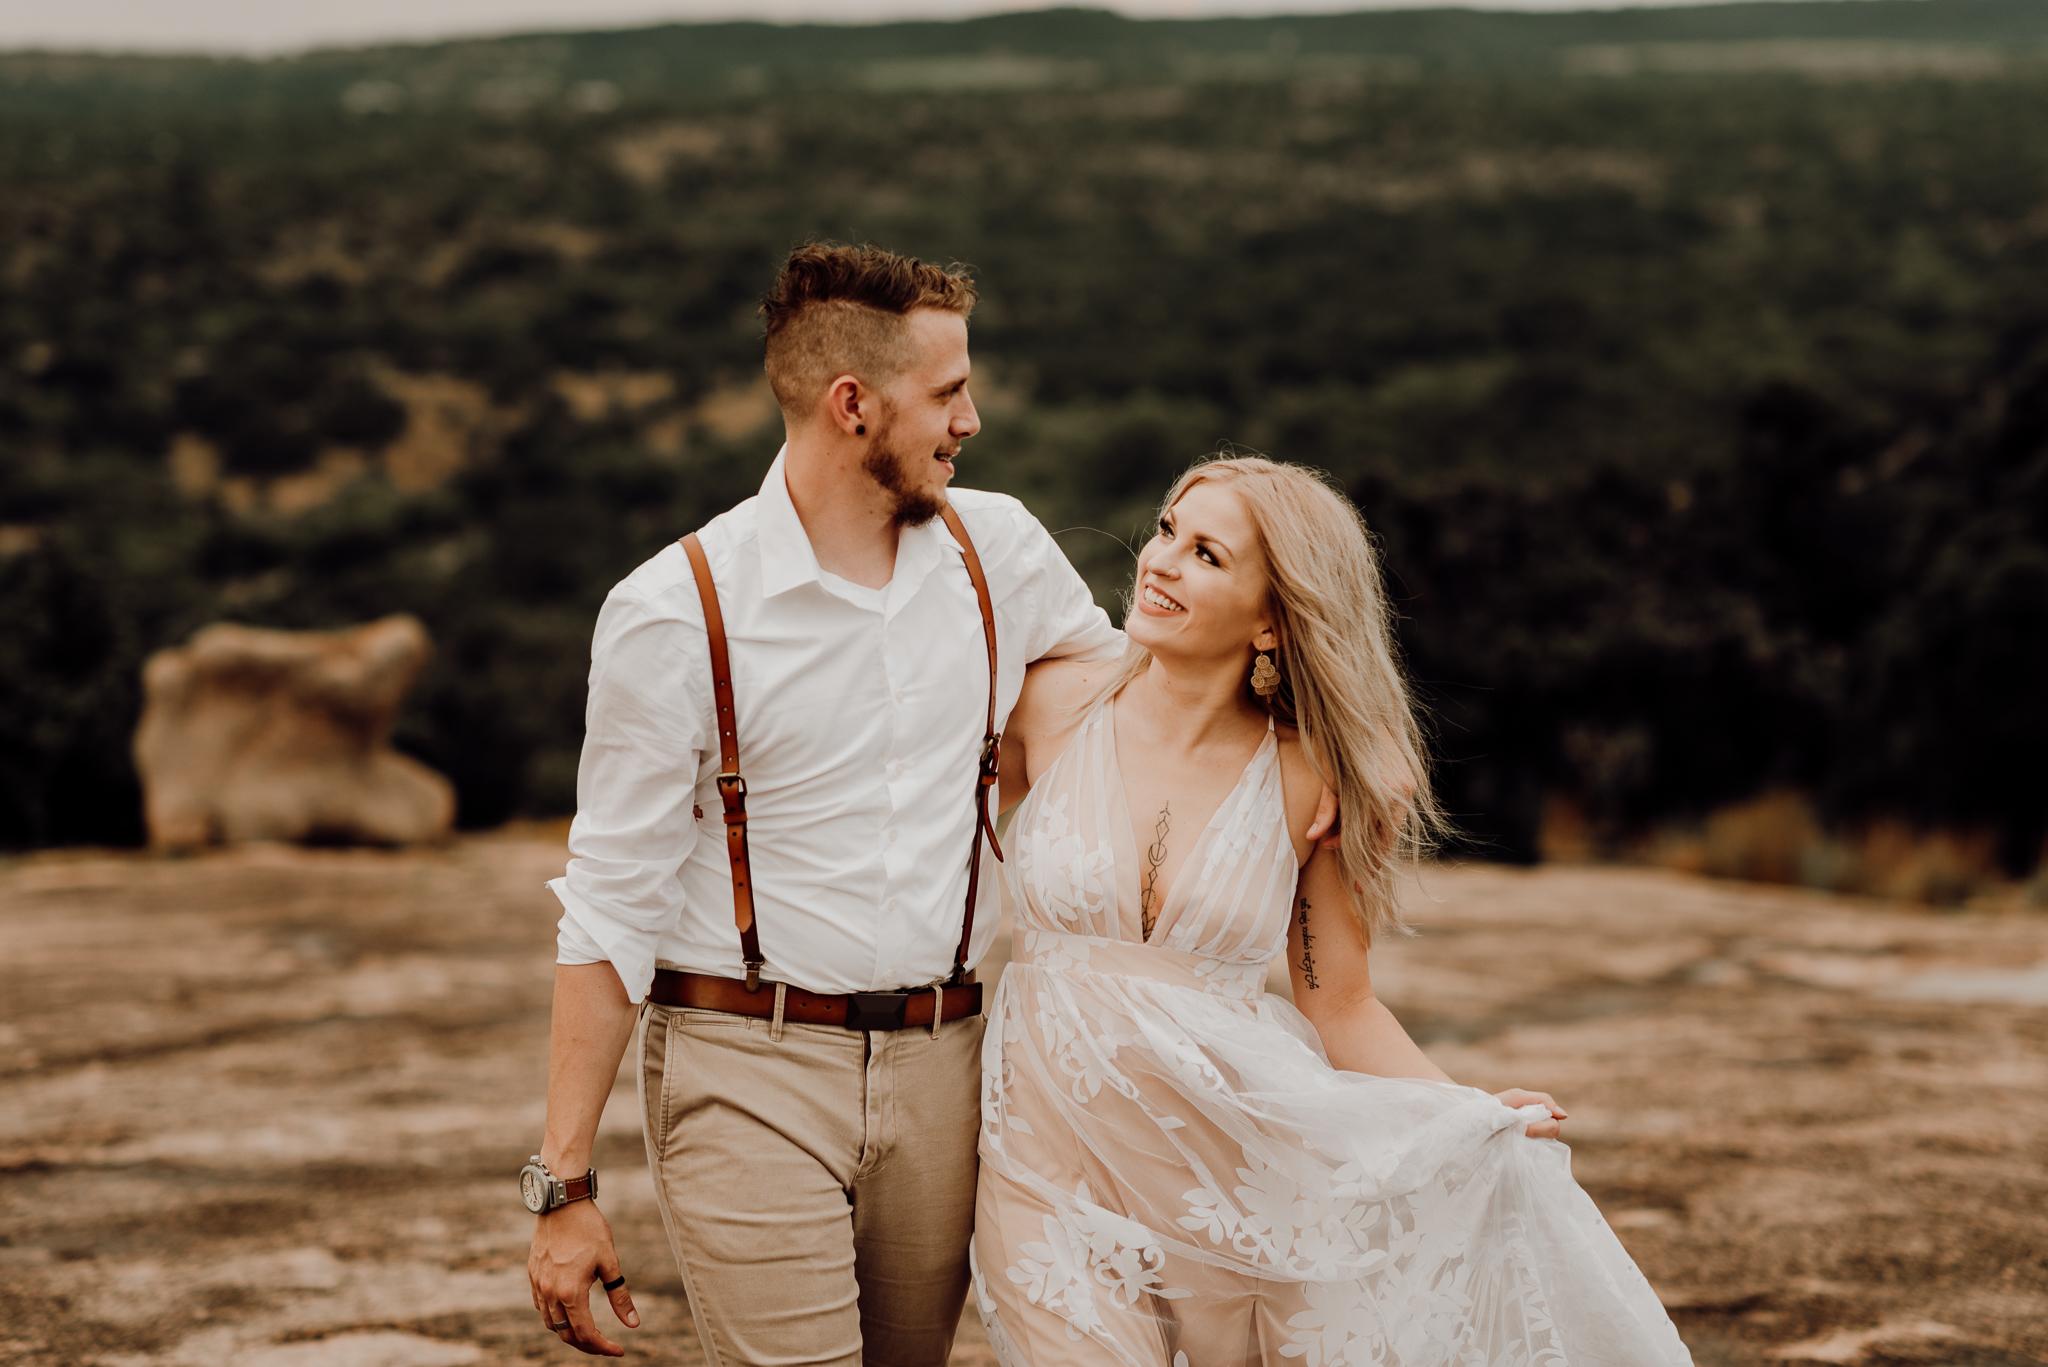 texas-elopement-photographer-enchanted-rock-32-blog.jpg